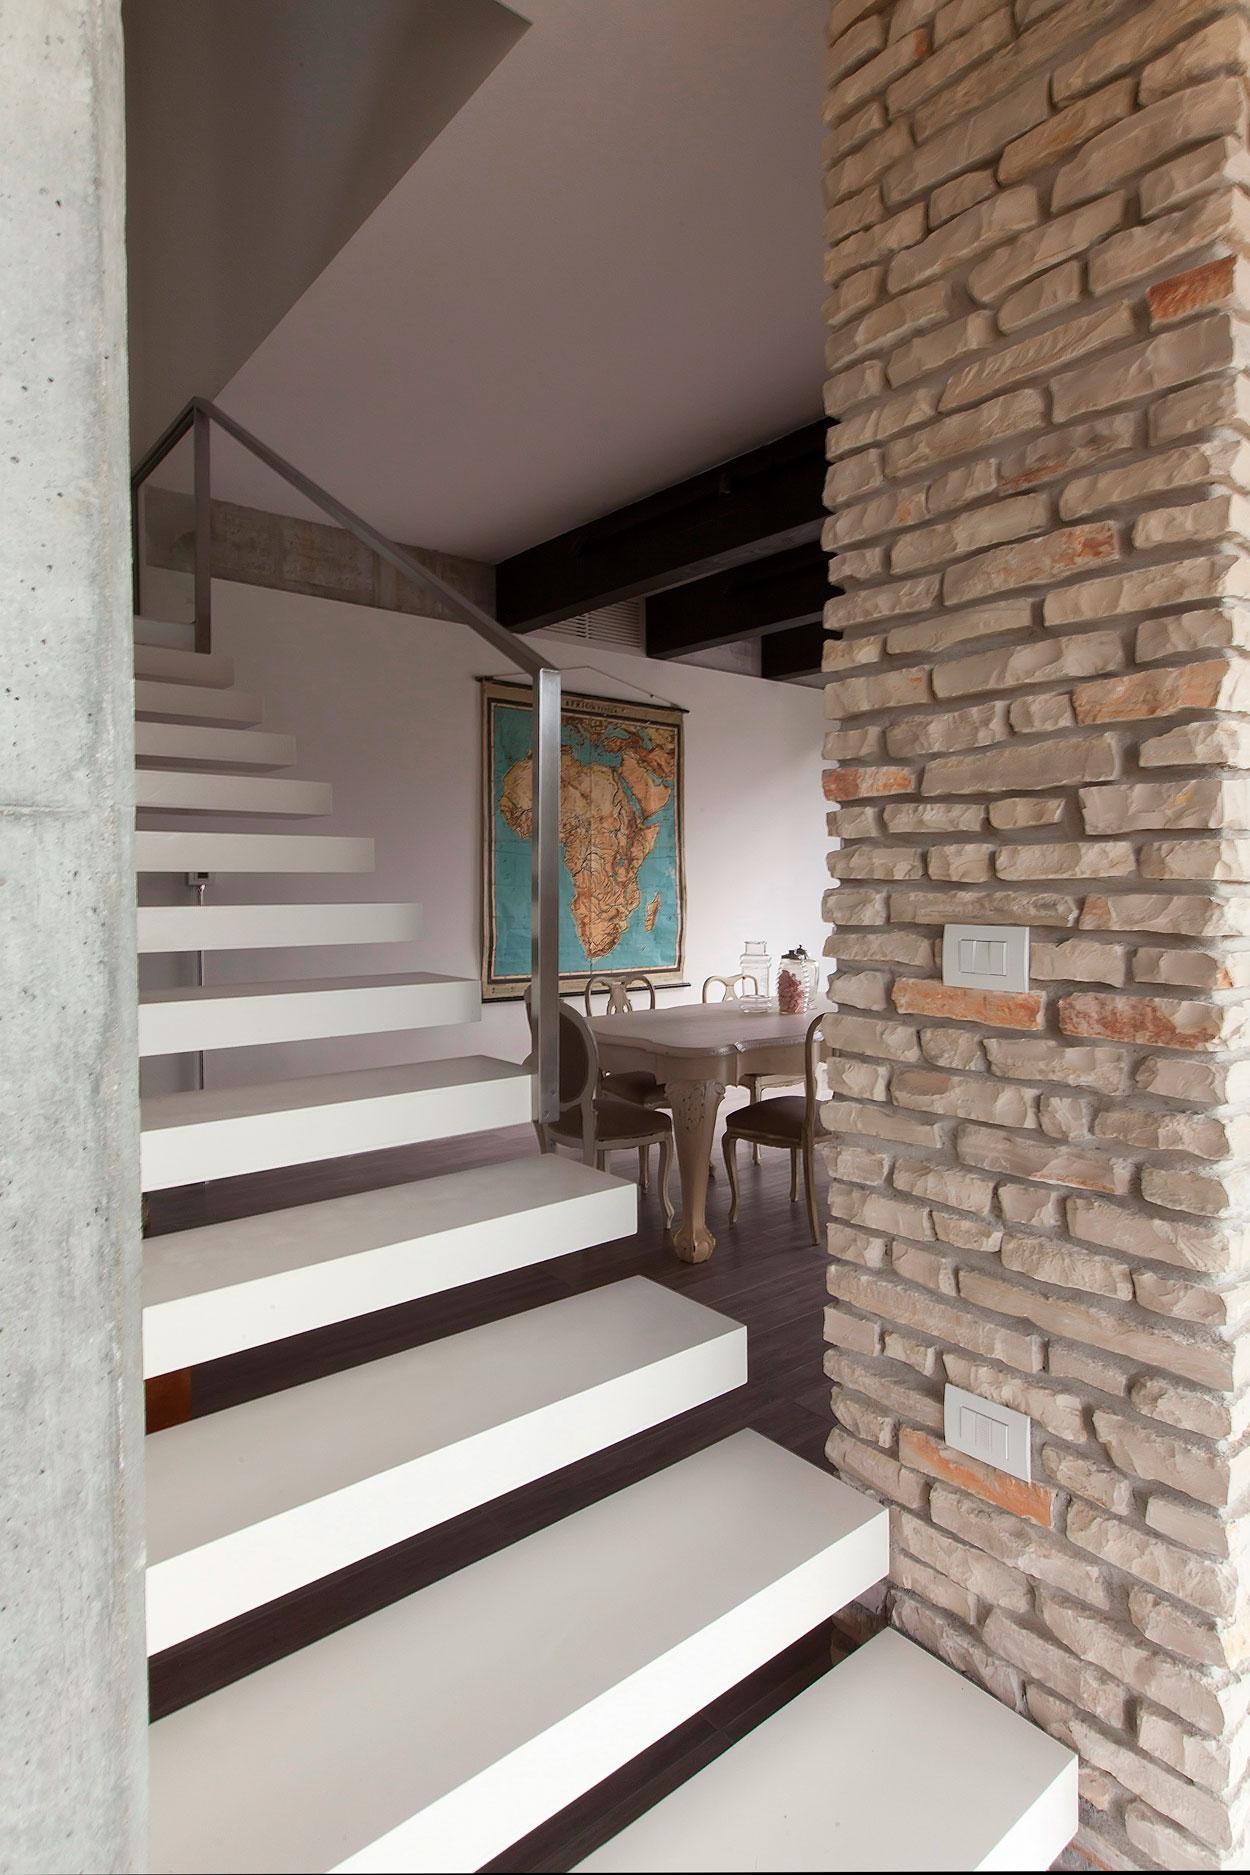 D'Autore Residence near Bologna by Giraldi Associati Architetti-30